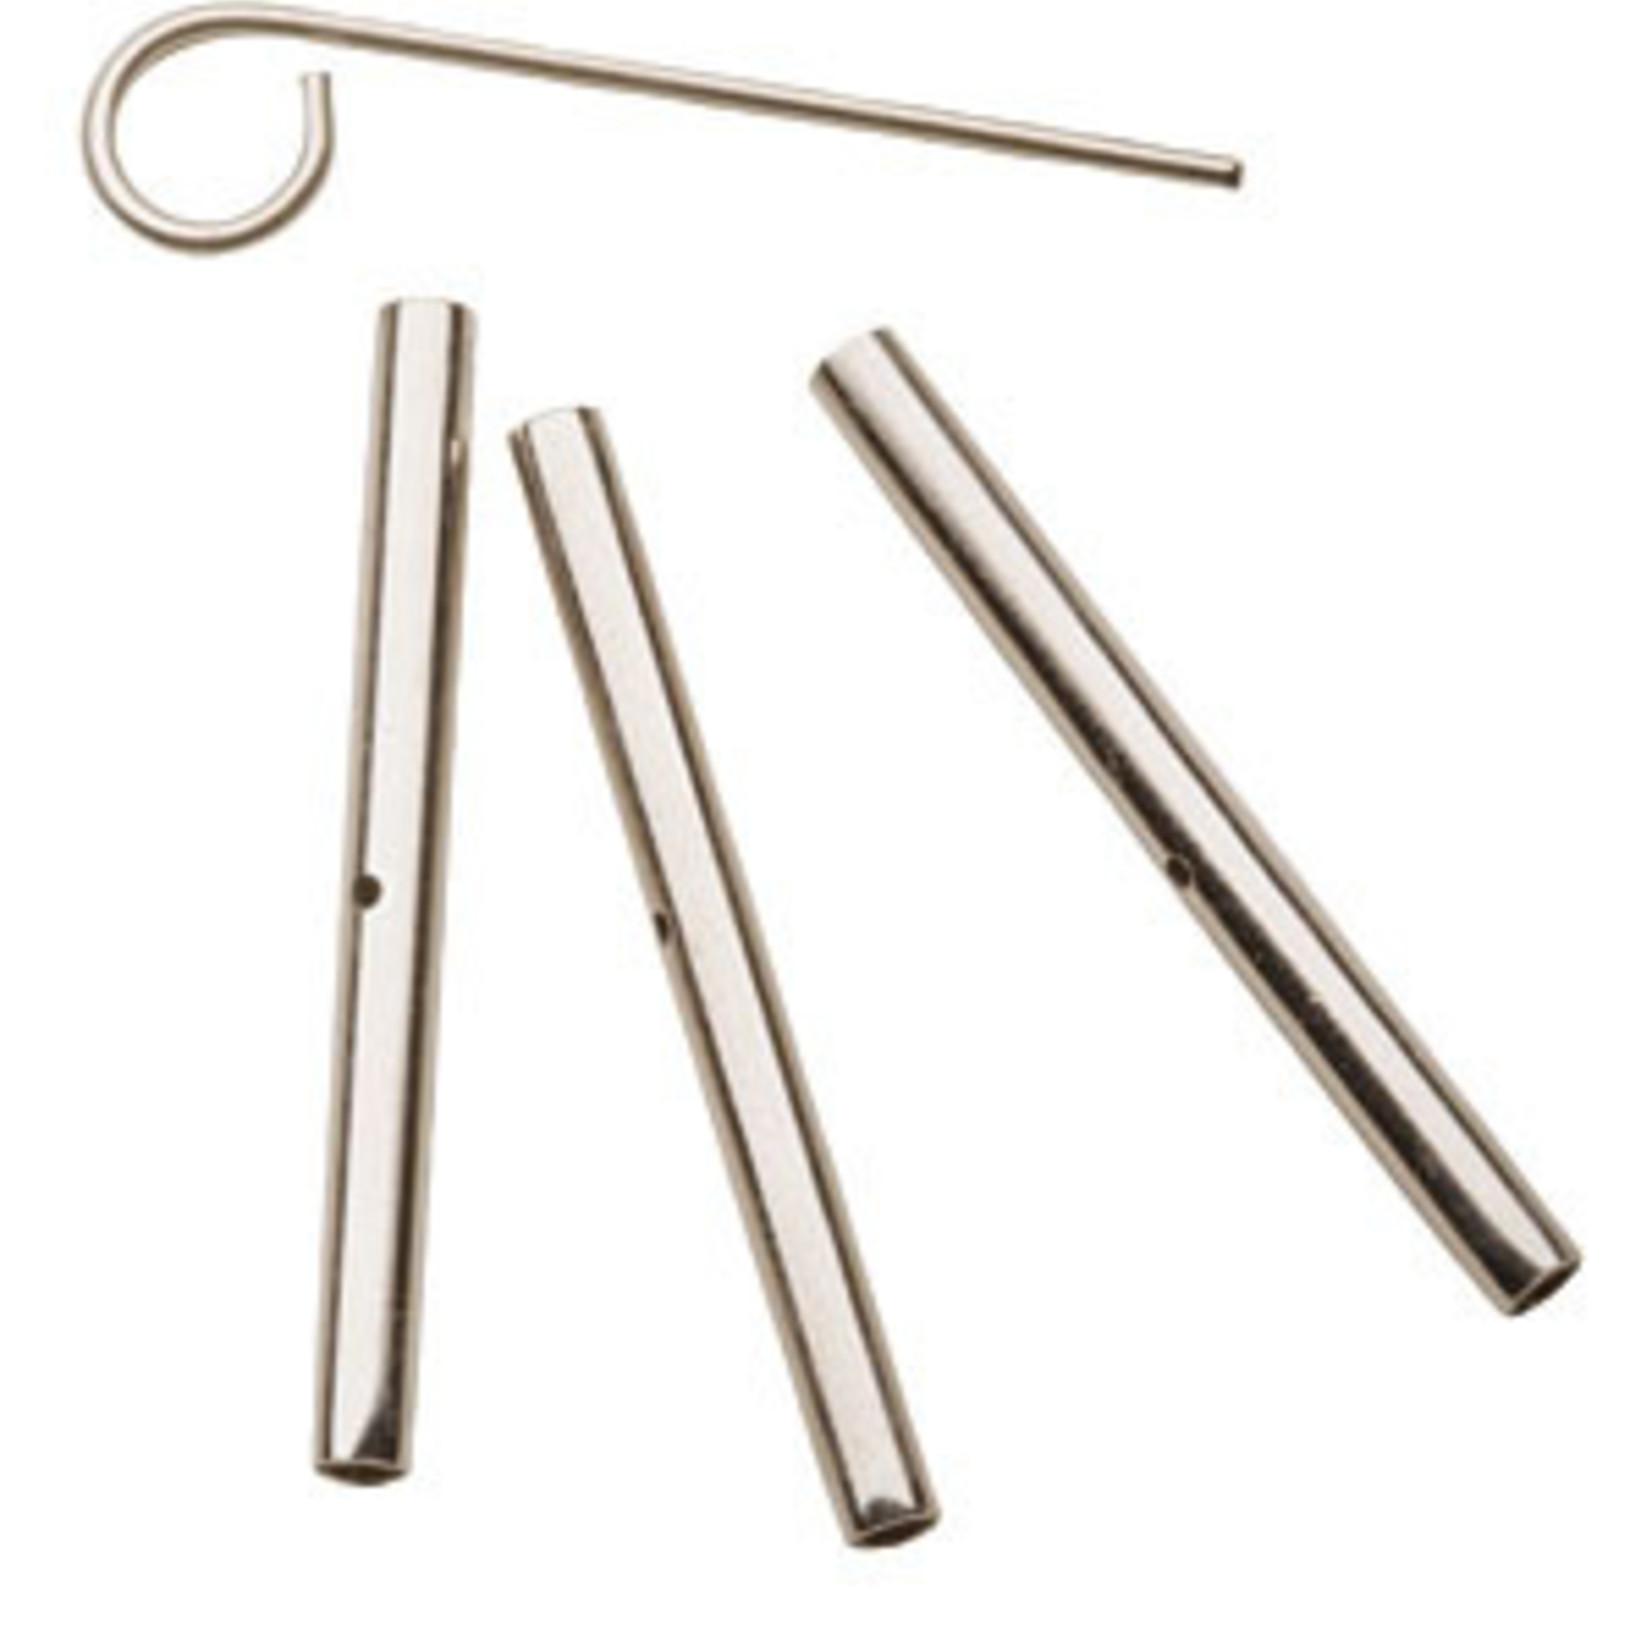 Knit Picks KNIT PICKS Interchangeable Circular Cable Connectors